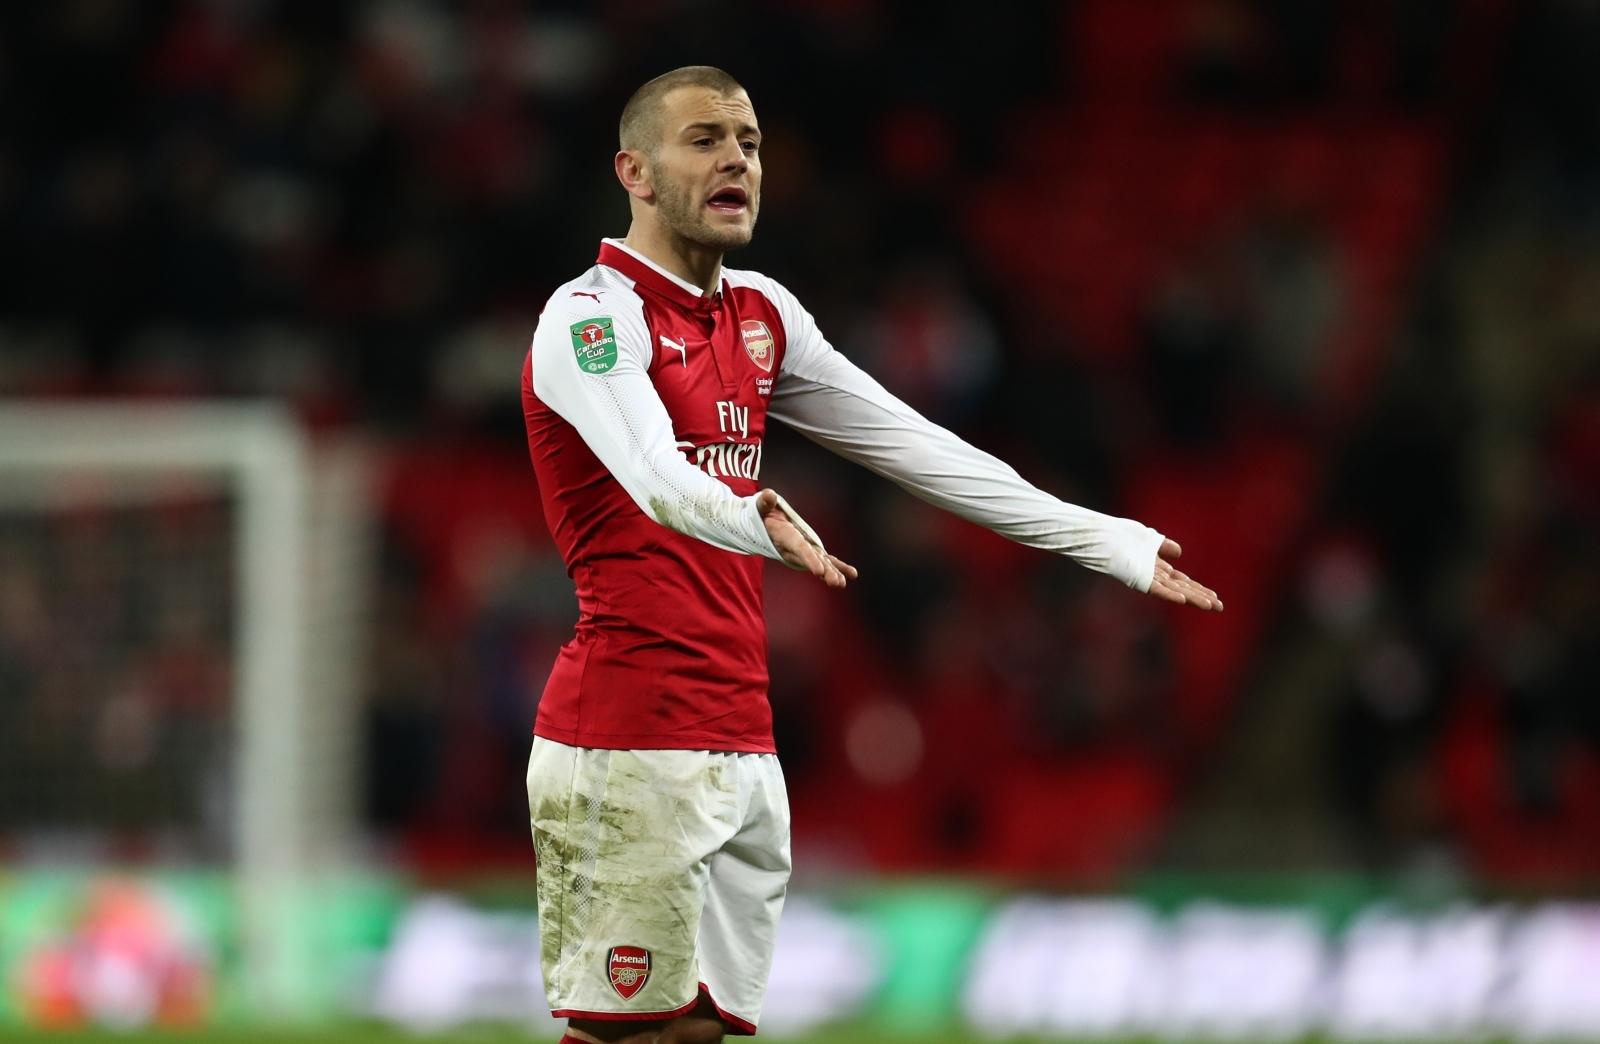 Under-pressure Arsene Wenger: I can still turn things around at Arsenal